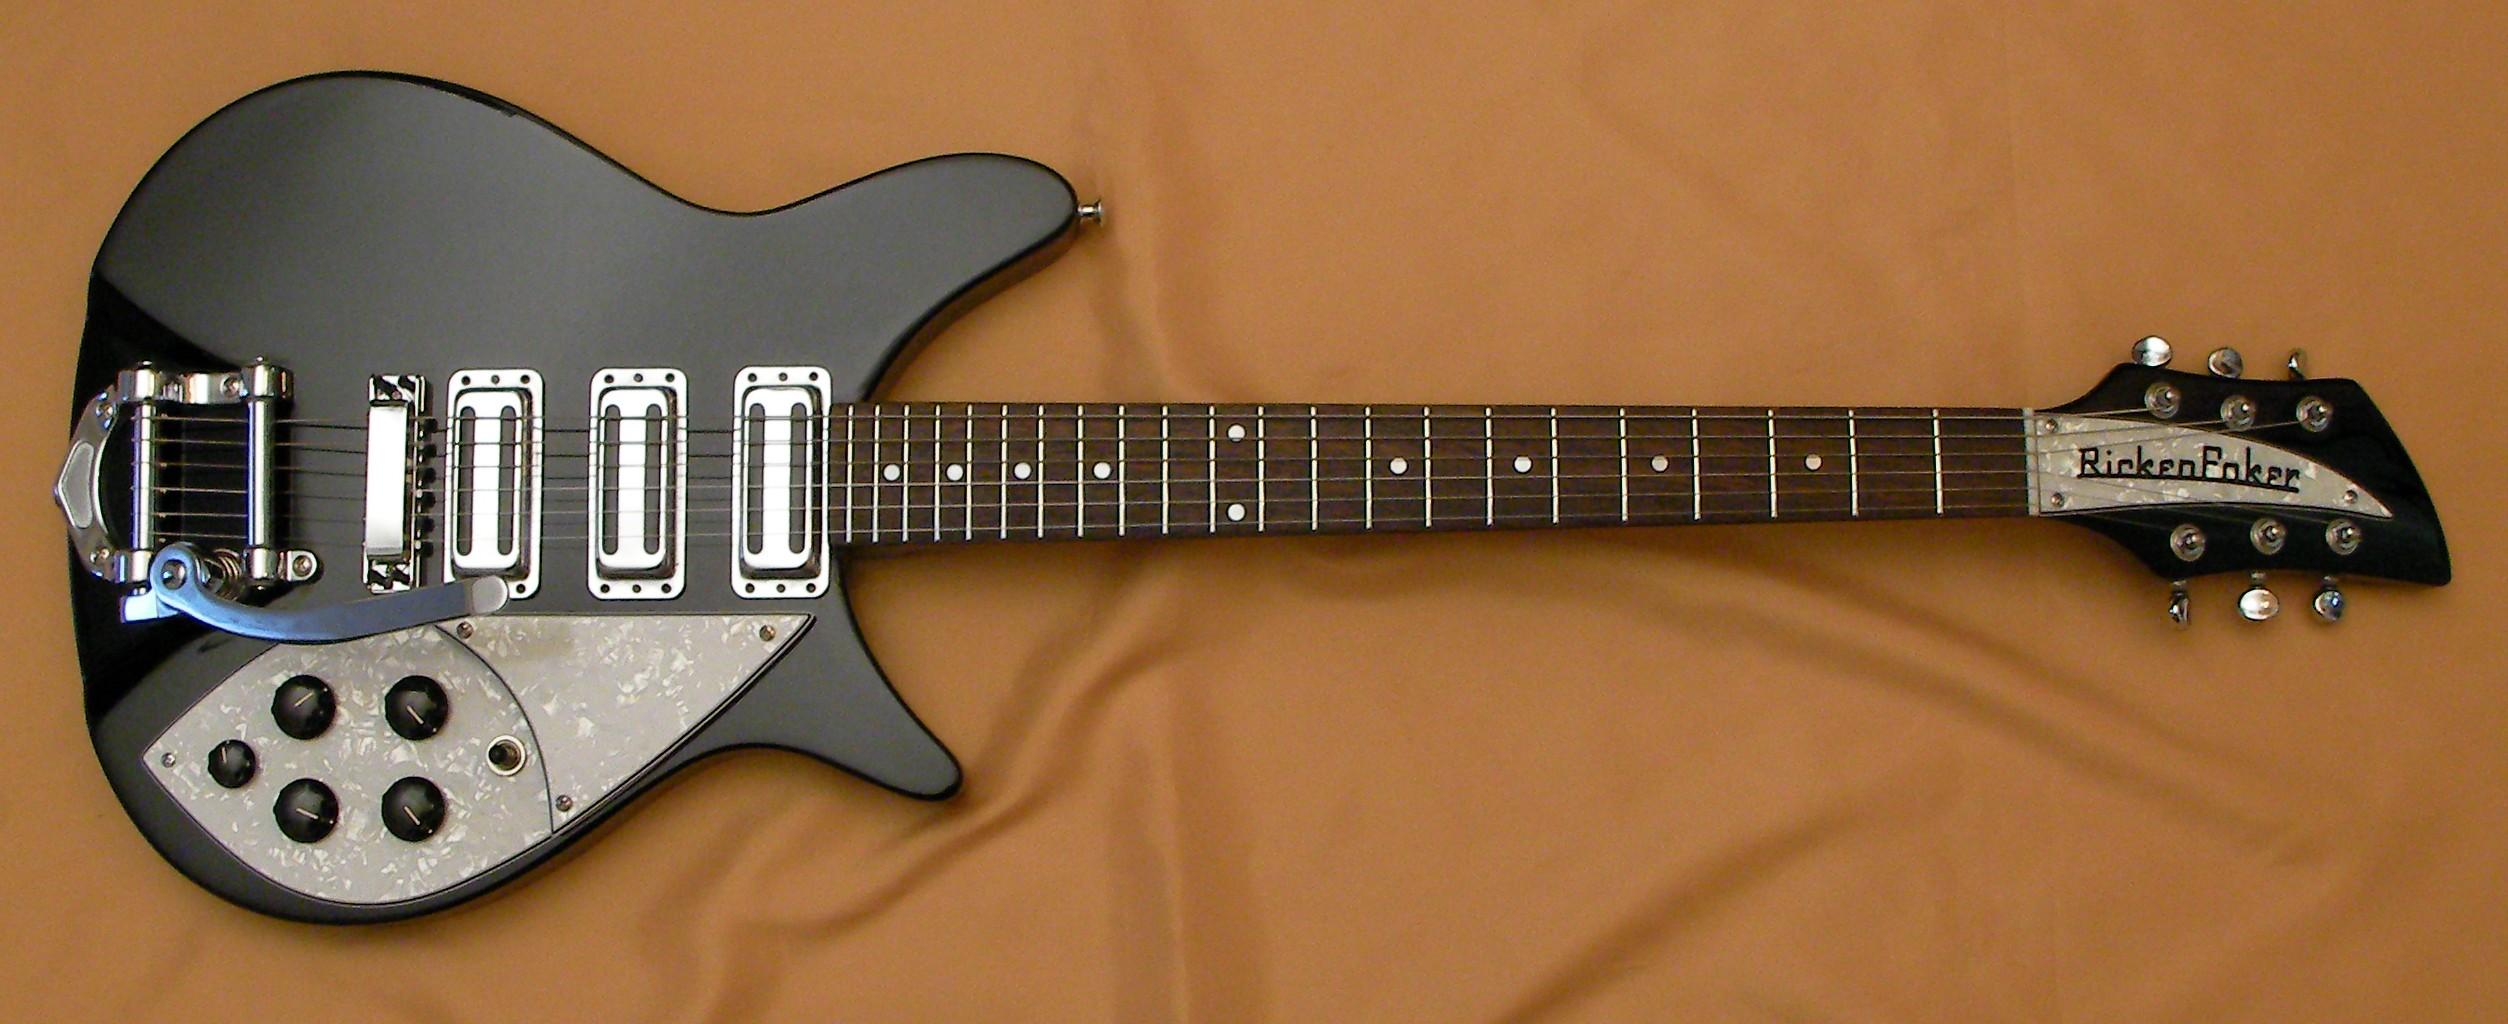 rickenbacker guitar wiring diagrams hyundai elantra diagram bartolini pickups ibanez pickup